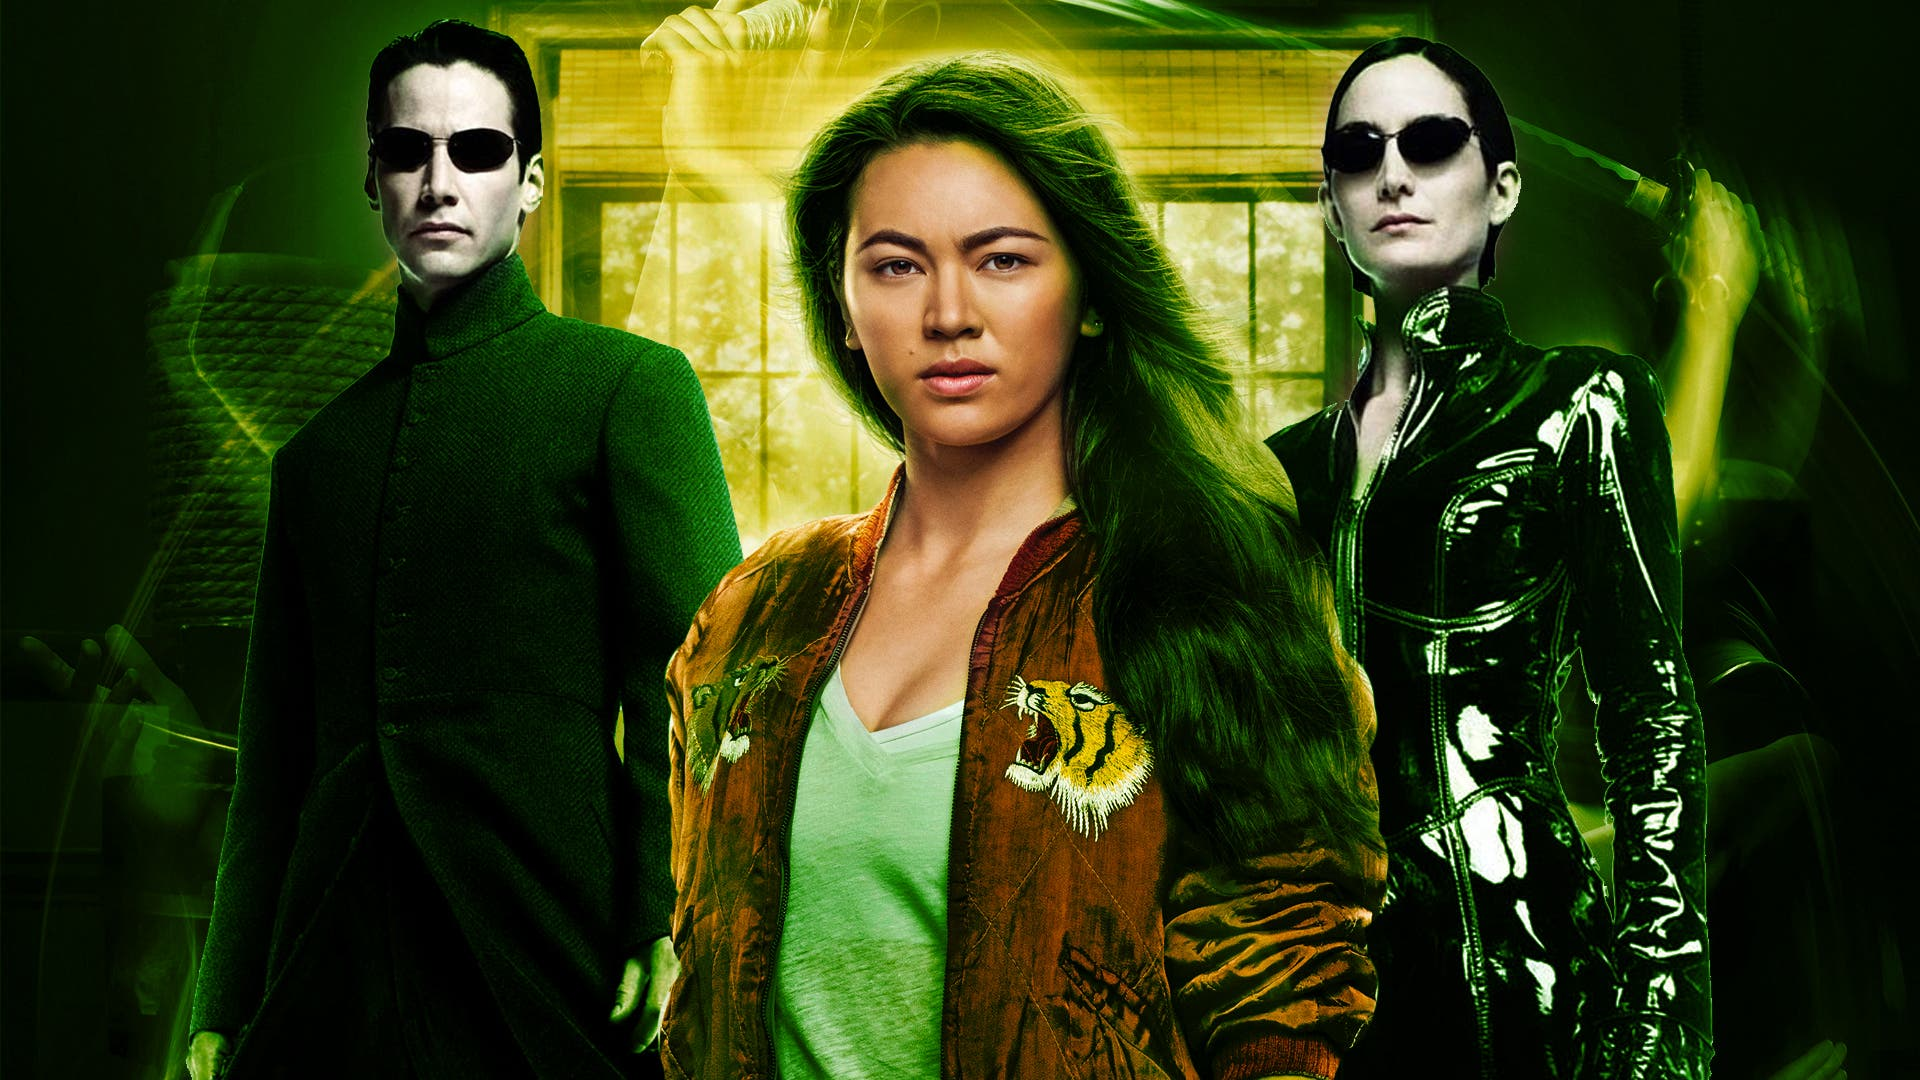 The matrix 4 Jessica Henwick